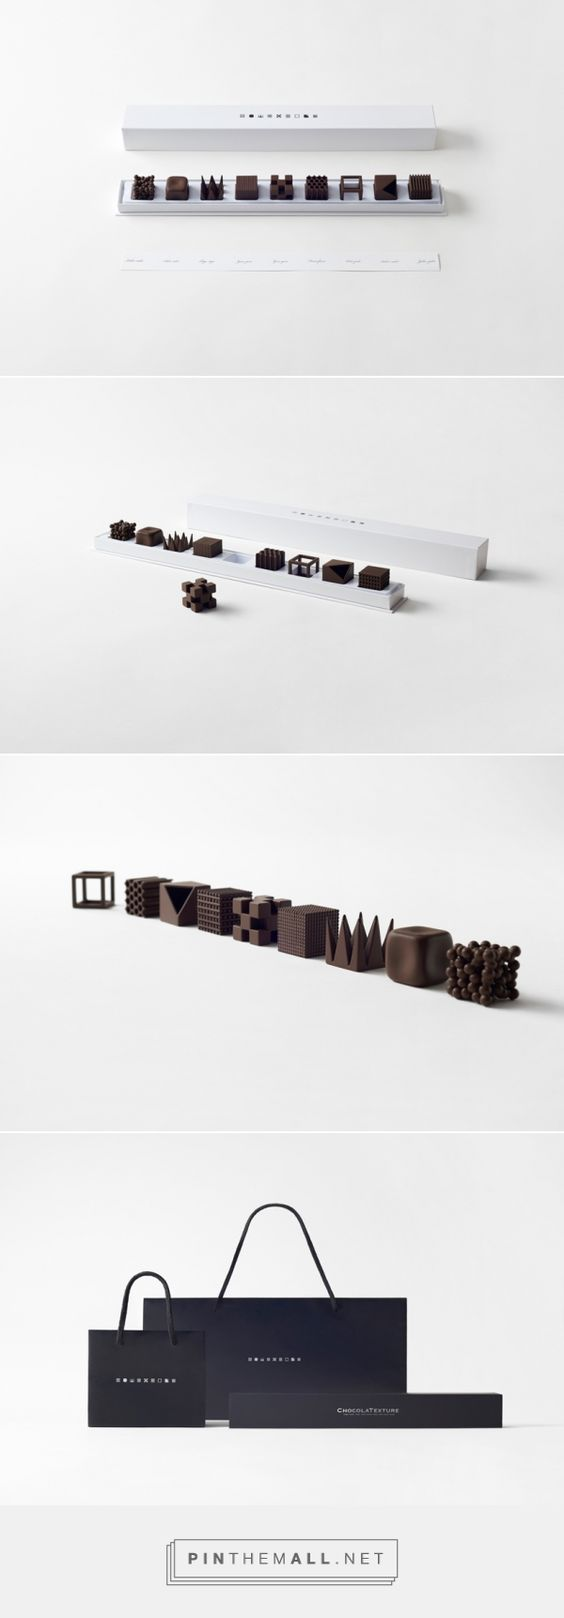 Packaging cioccolato